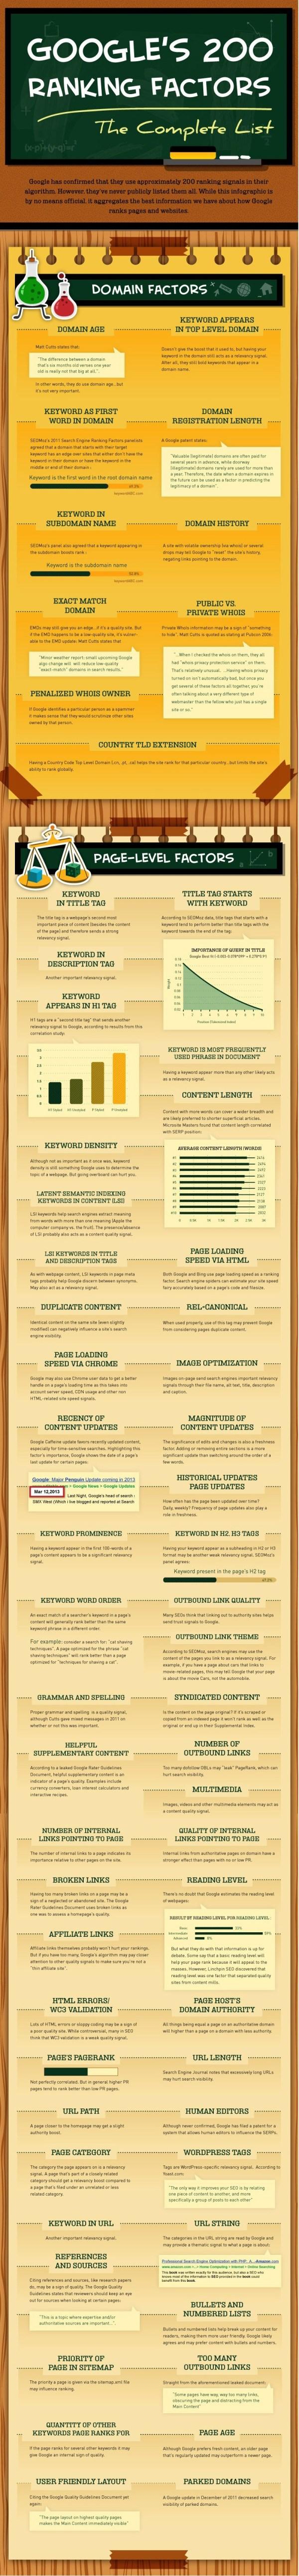 google-ranking-factors-1